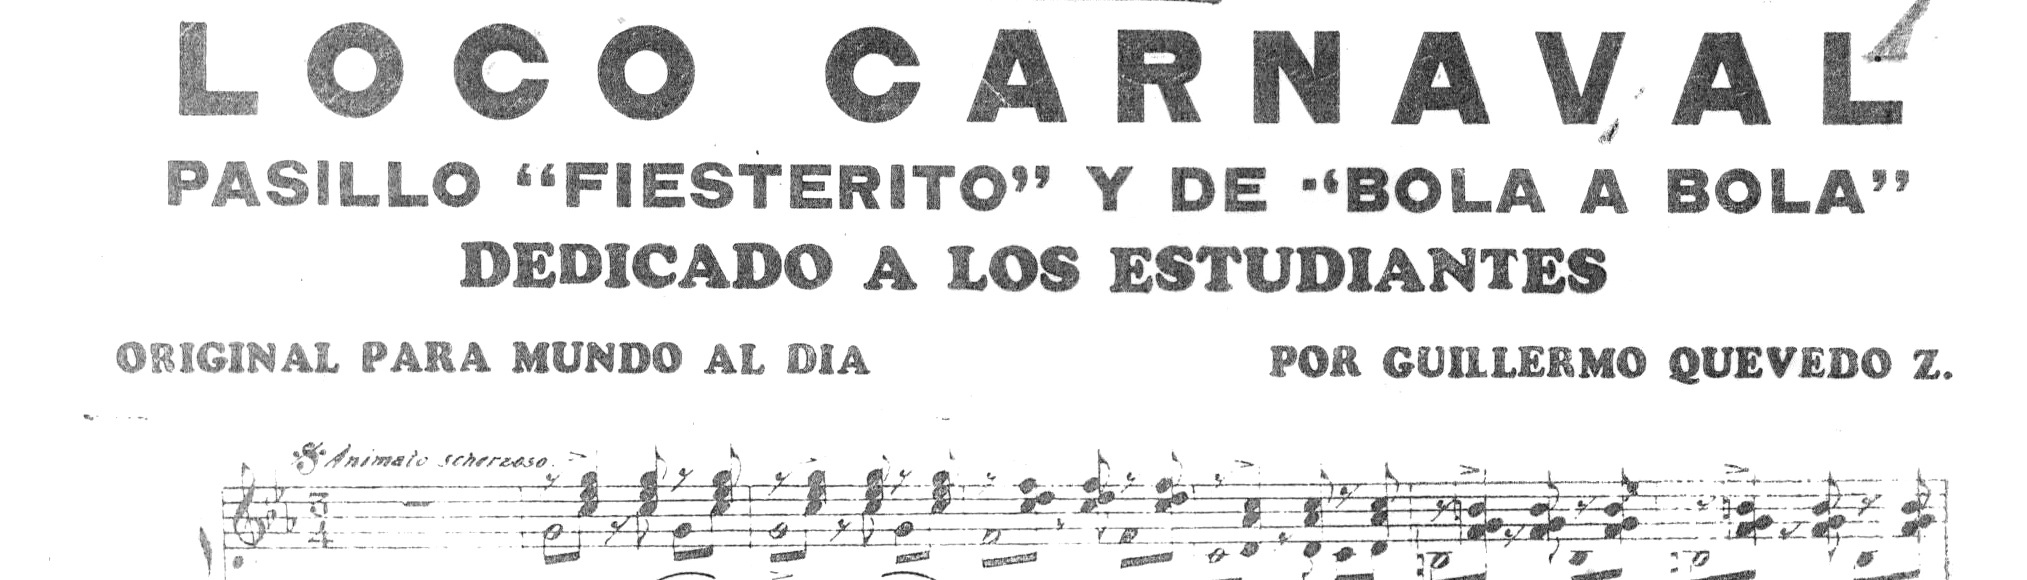 Loco-carnaval